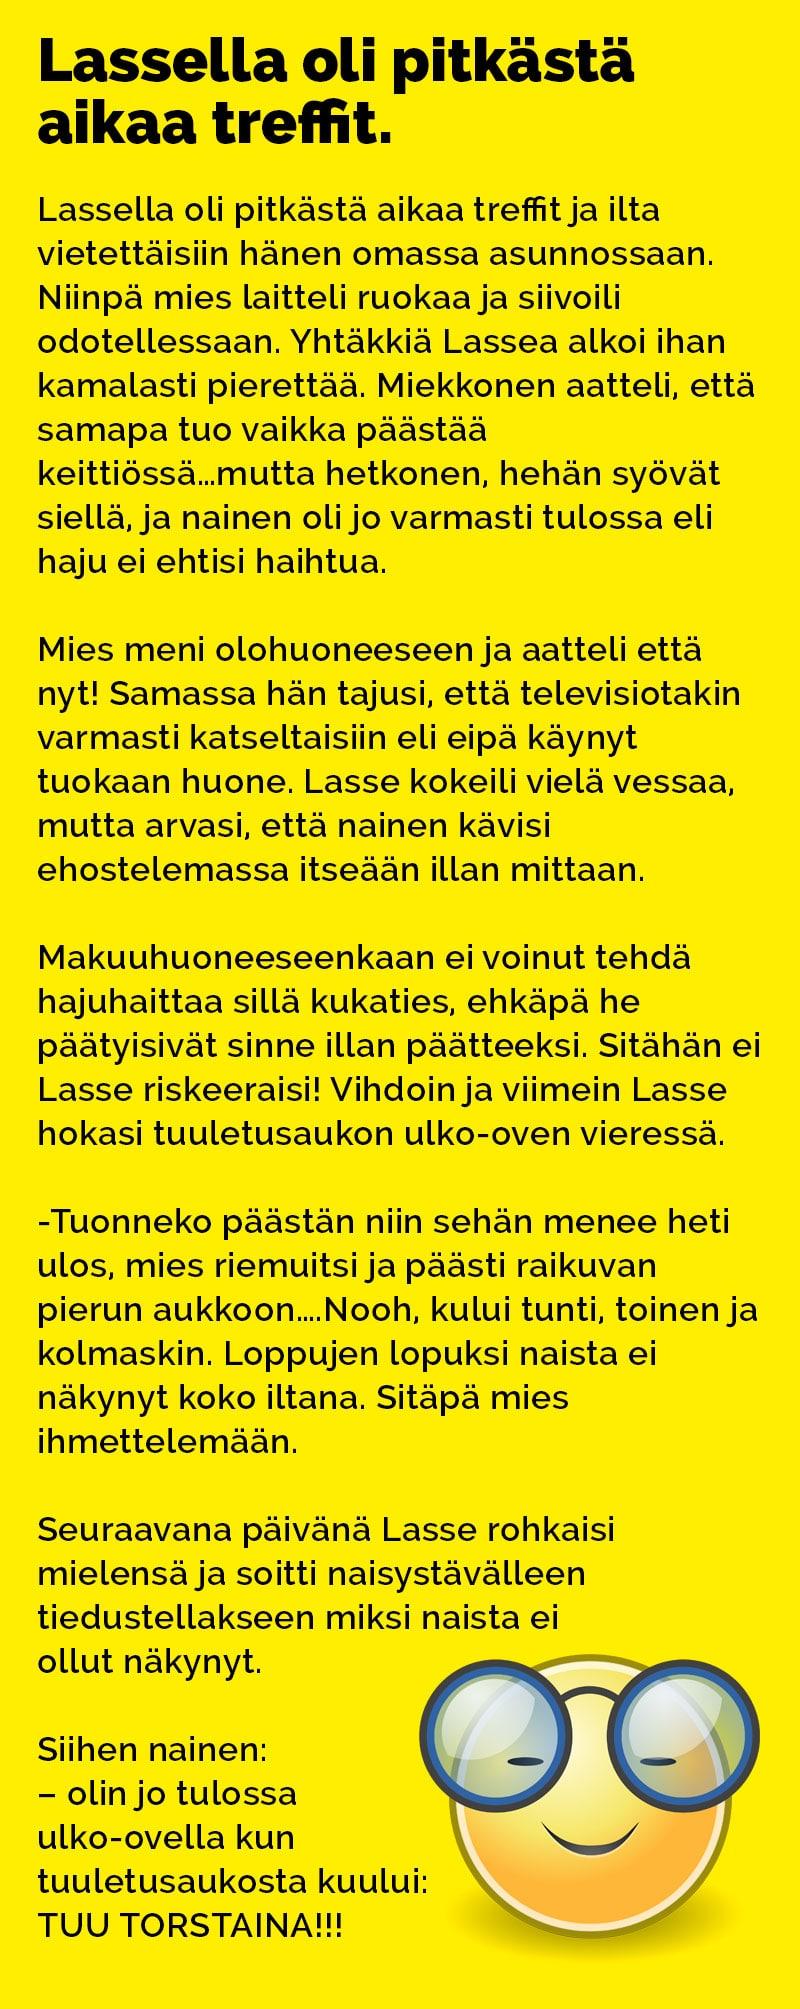 lasella_oli_treffit_2i